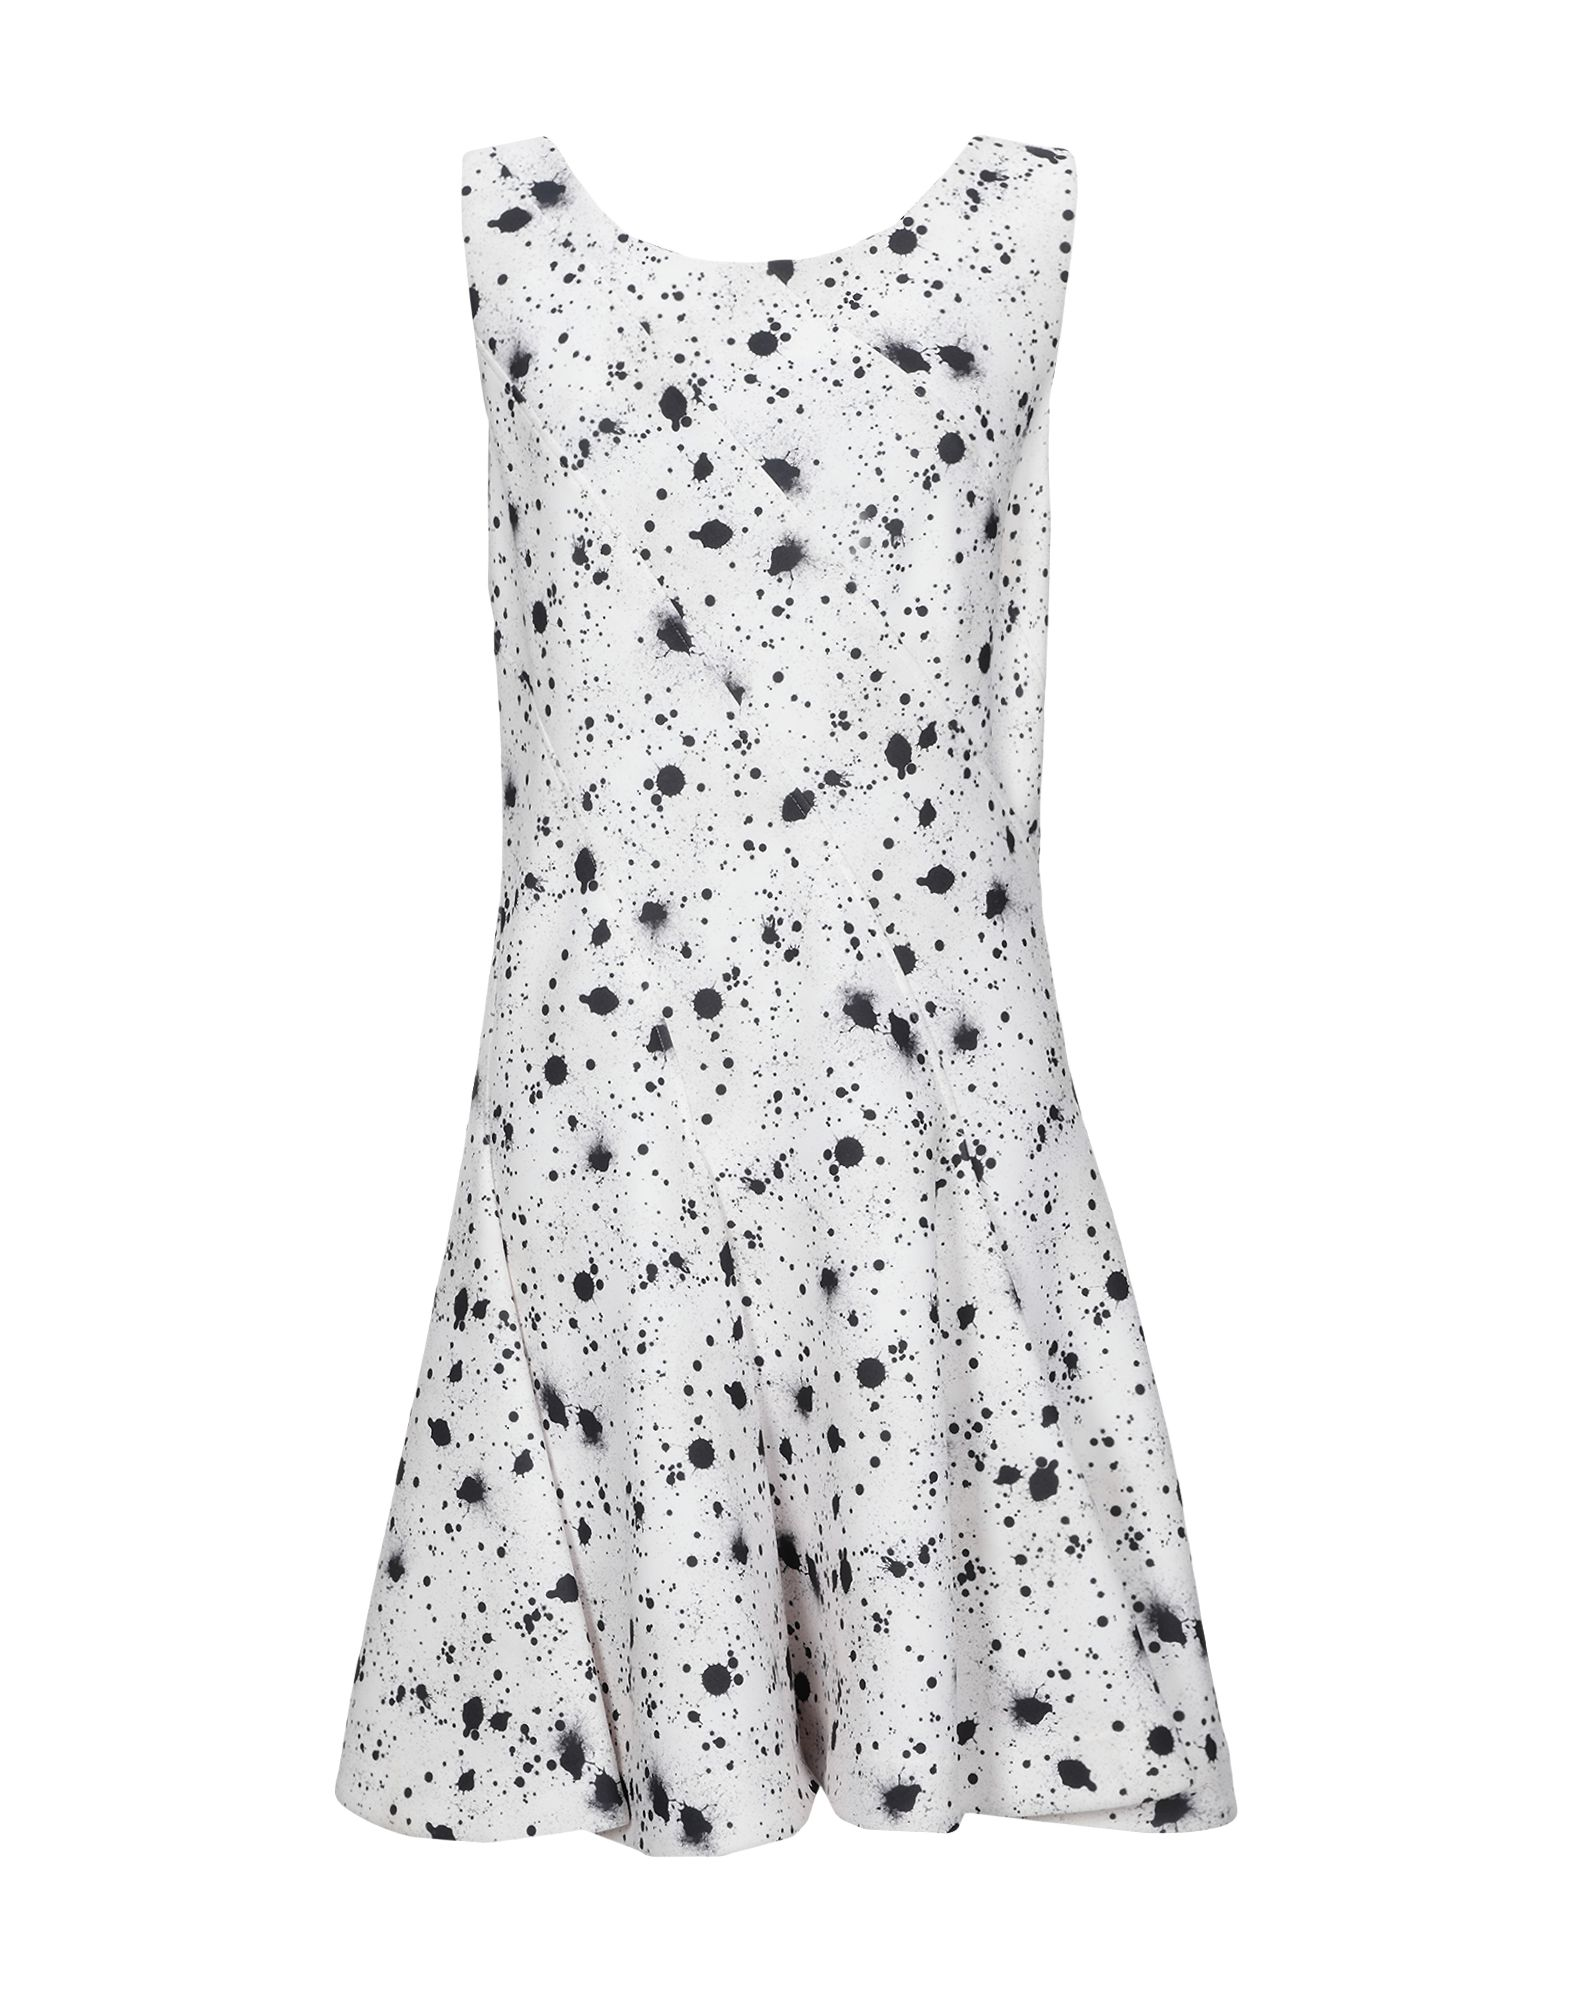 цена на ZAC ZAC POSEN Платье до колена